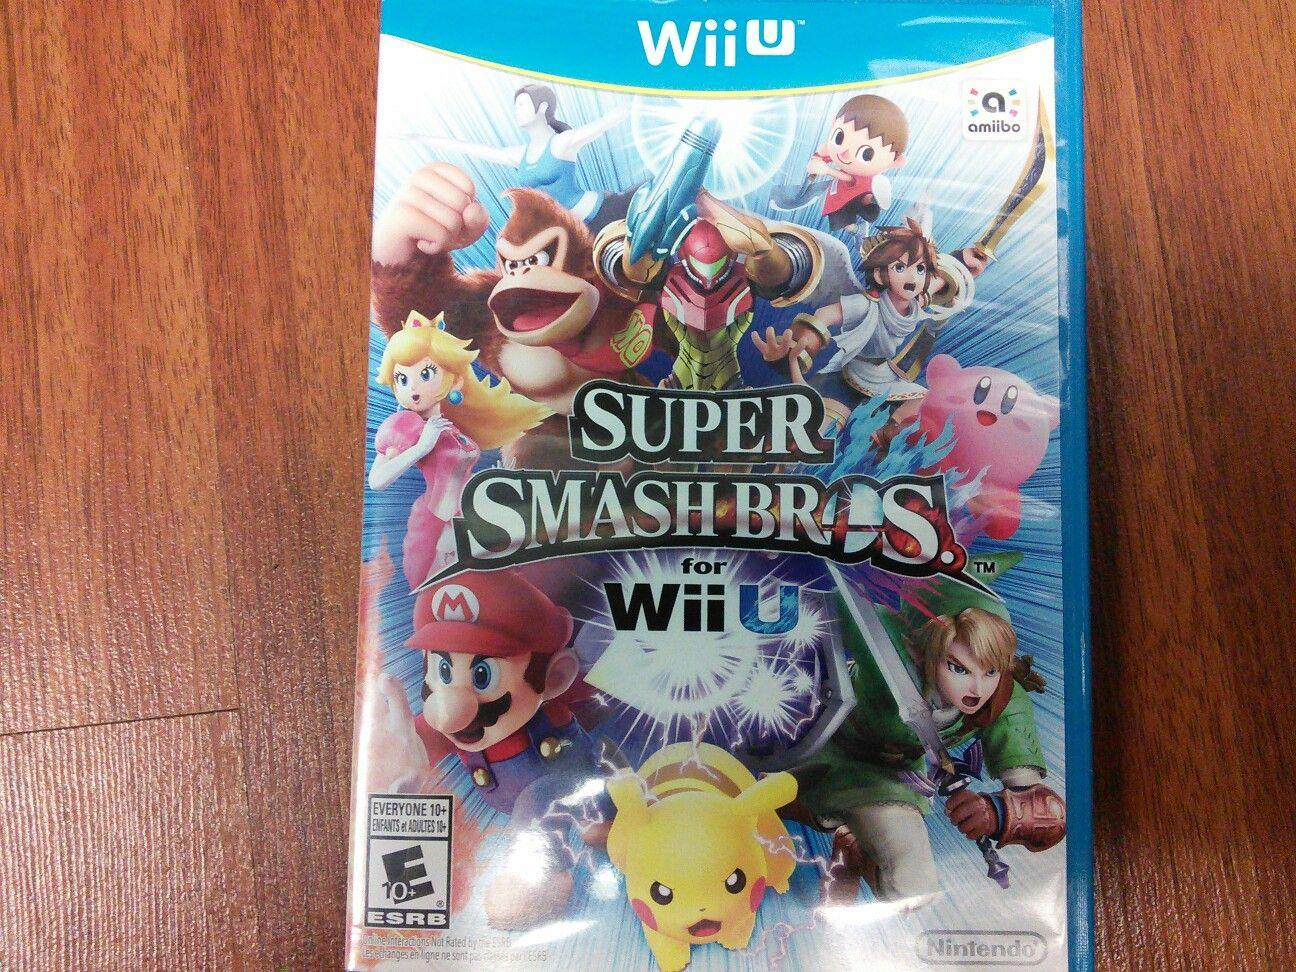 Tomorrow we are having a Super Smash Bros. Wii U